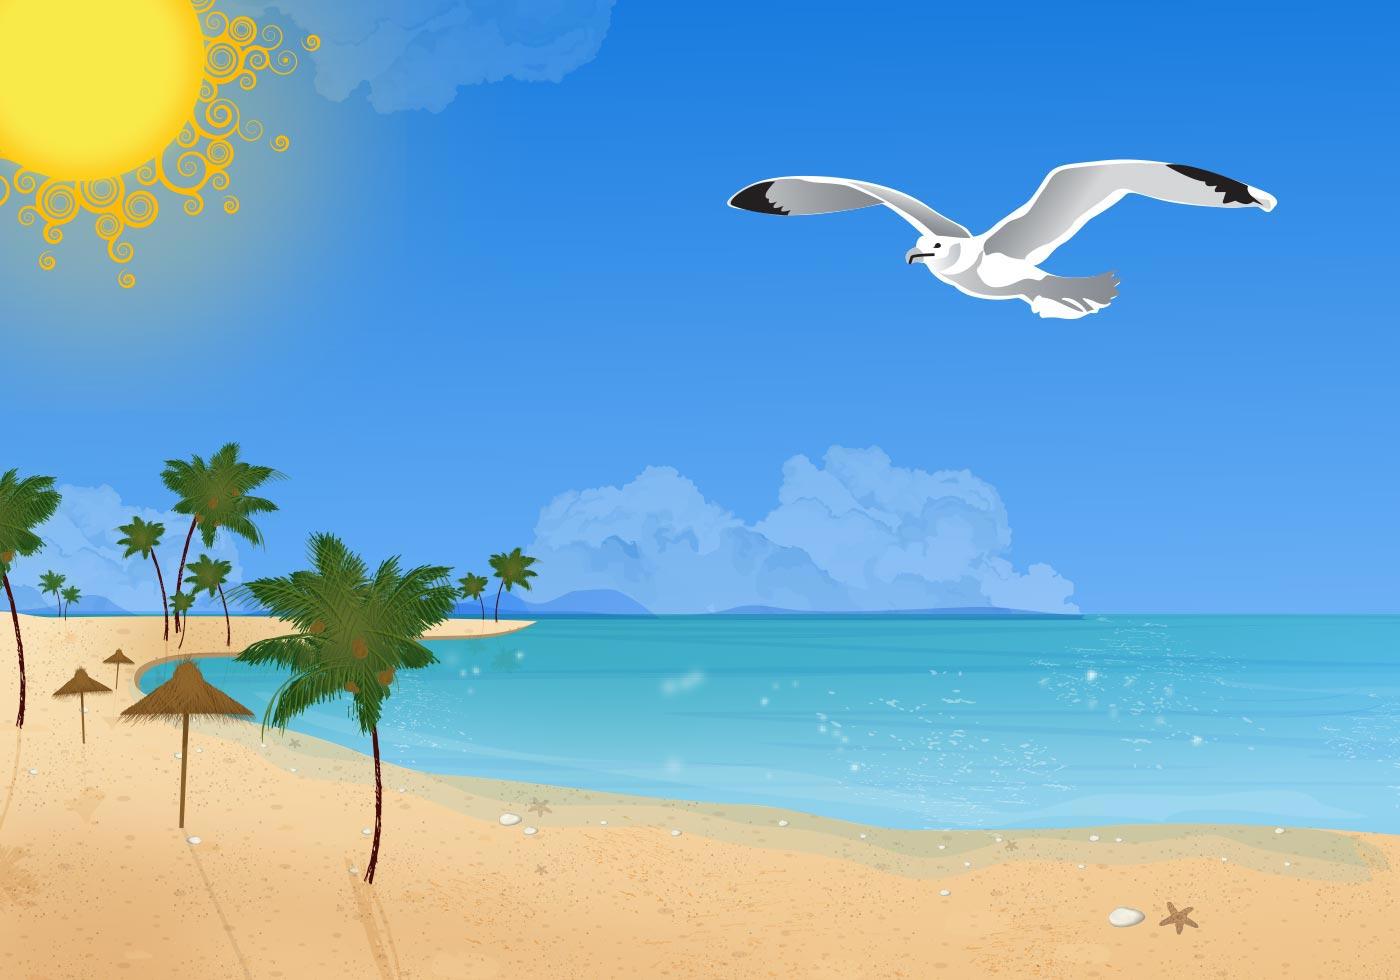 Summer beach with Seagulls - Download Free Vector Art ...